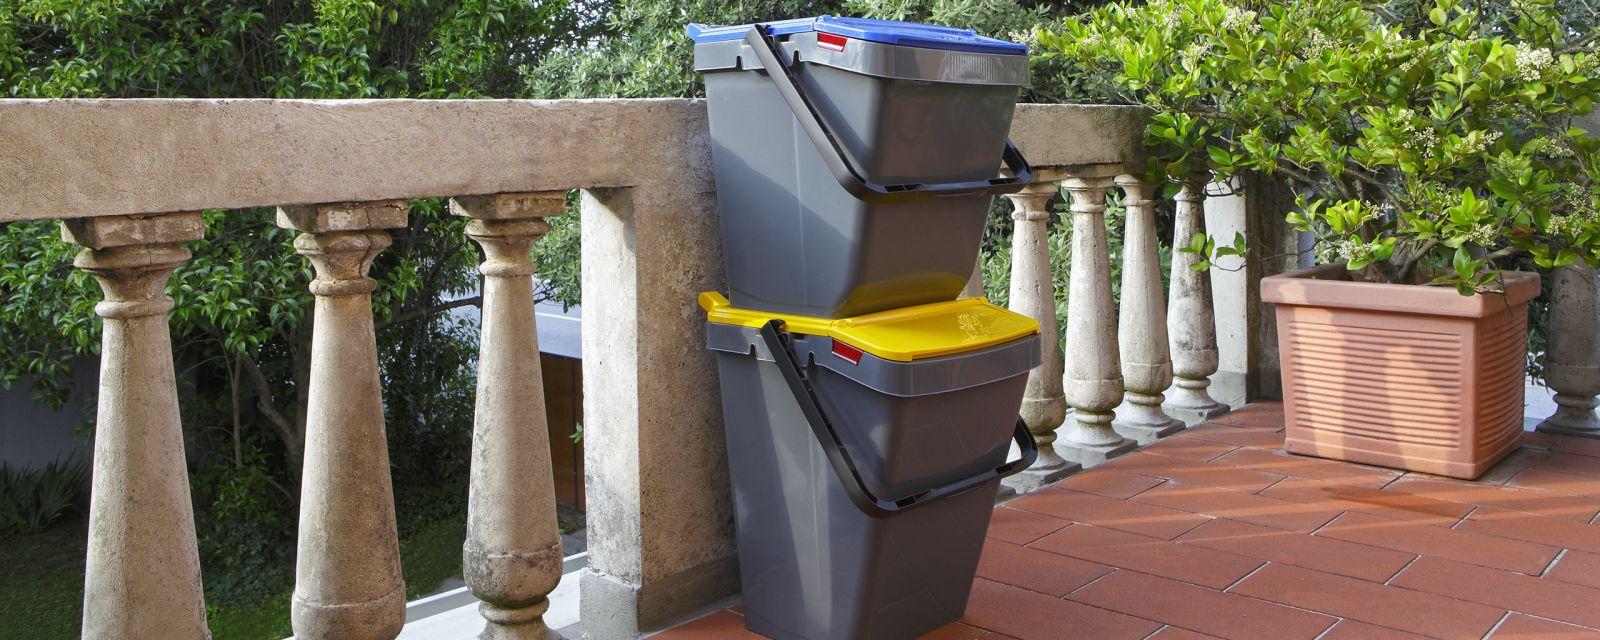 Stapelbare Recycling Müllbehälter